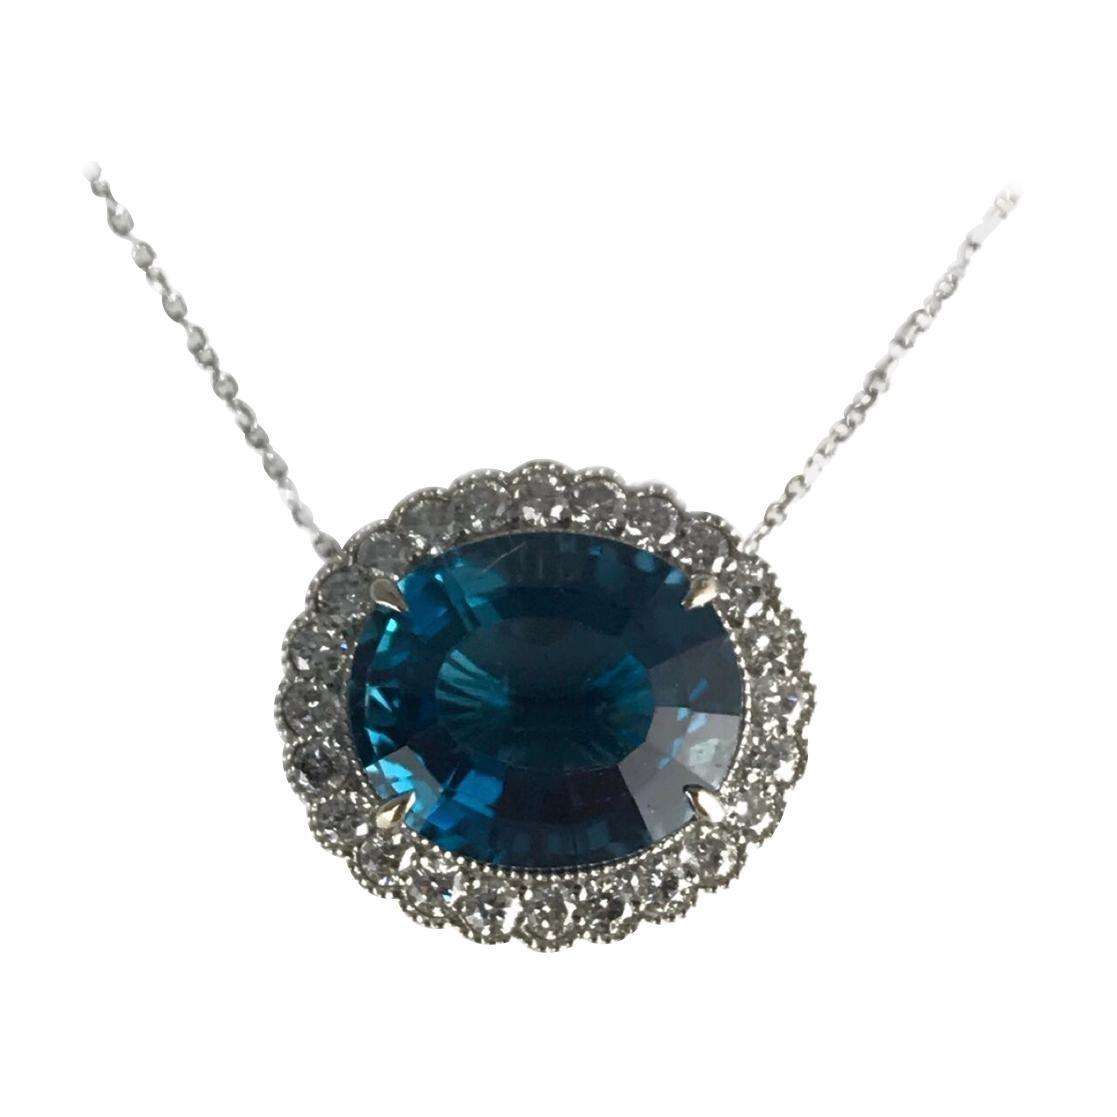 DiamondTown 10.6 Carat Blue Topaz and 0.80 Ct Diamond Pendant in 14k White Gold